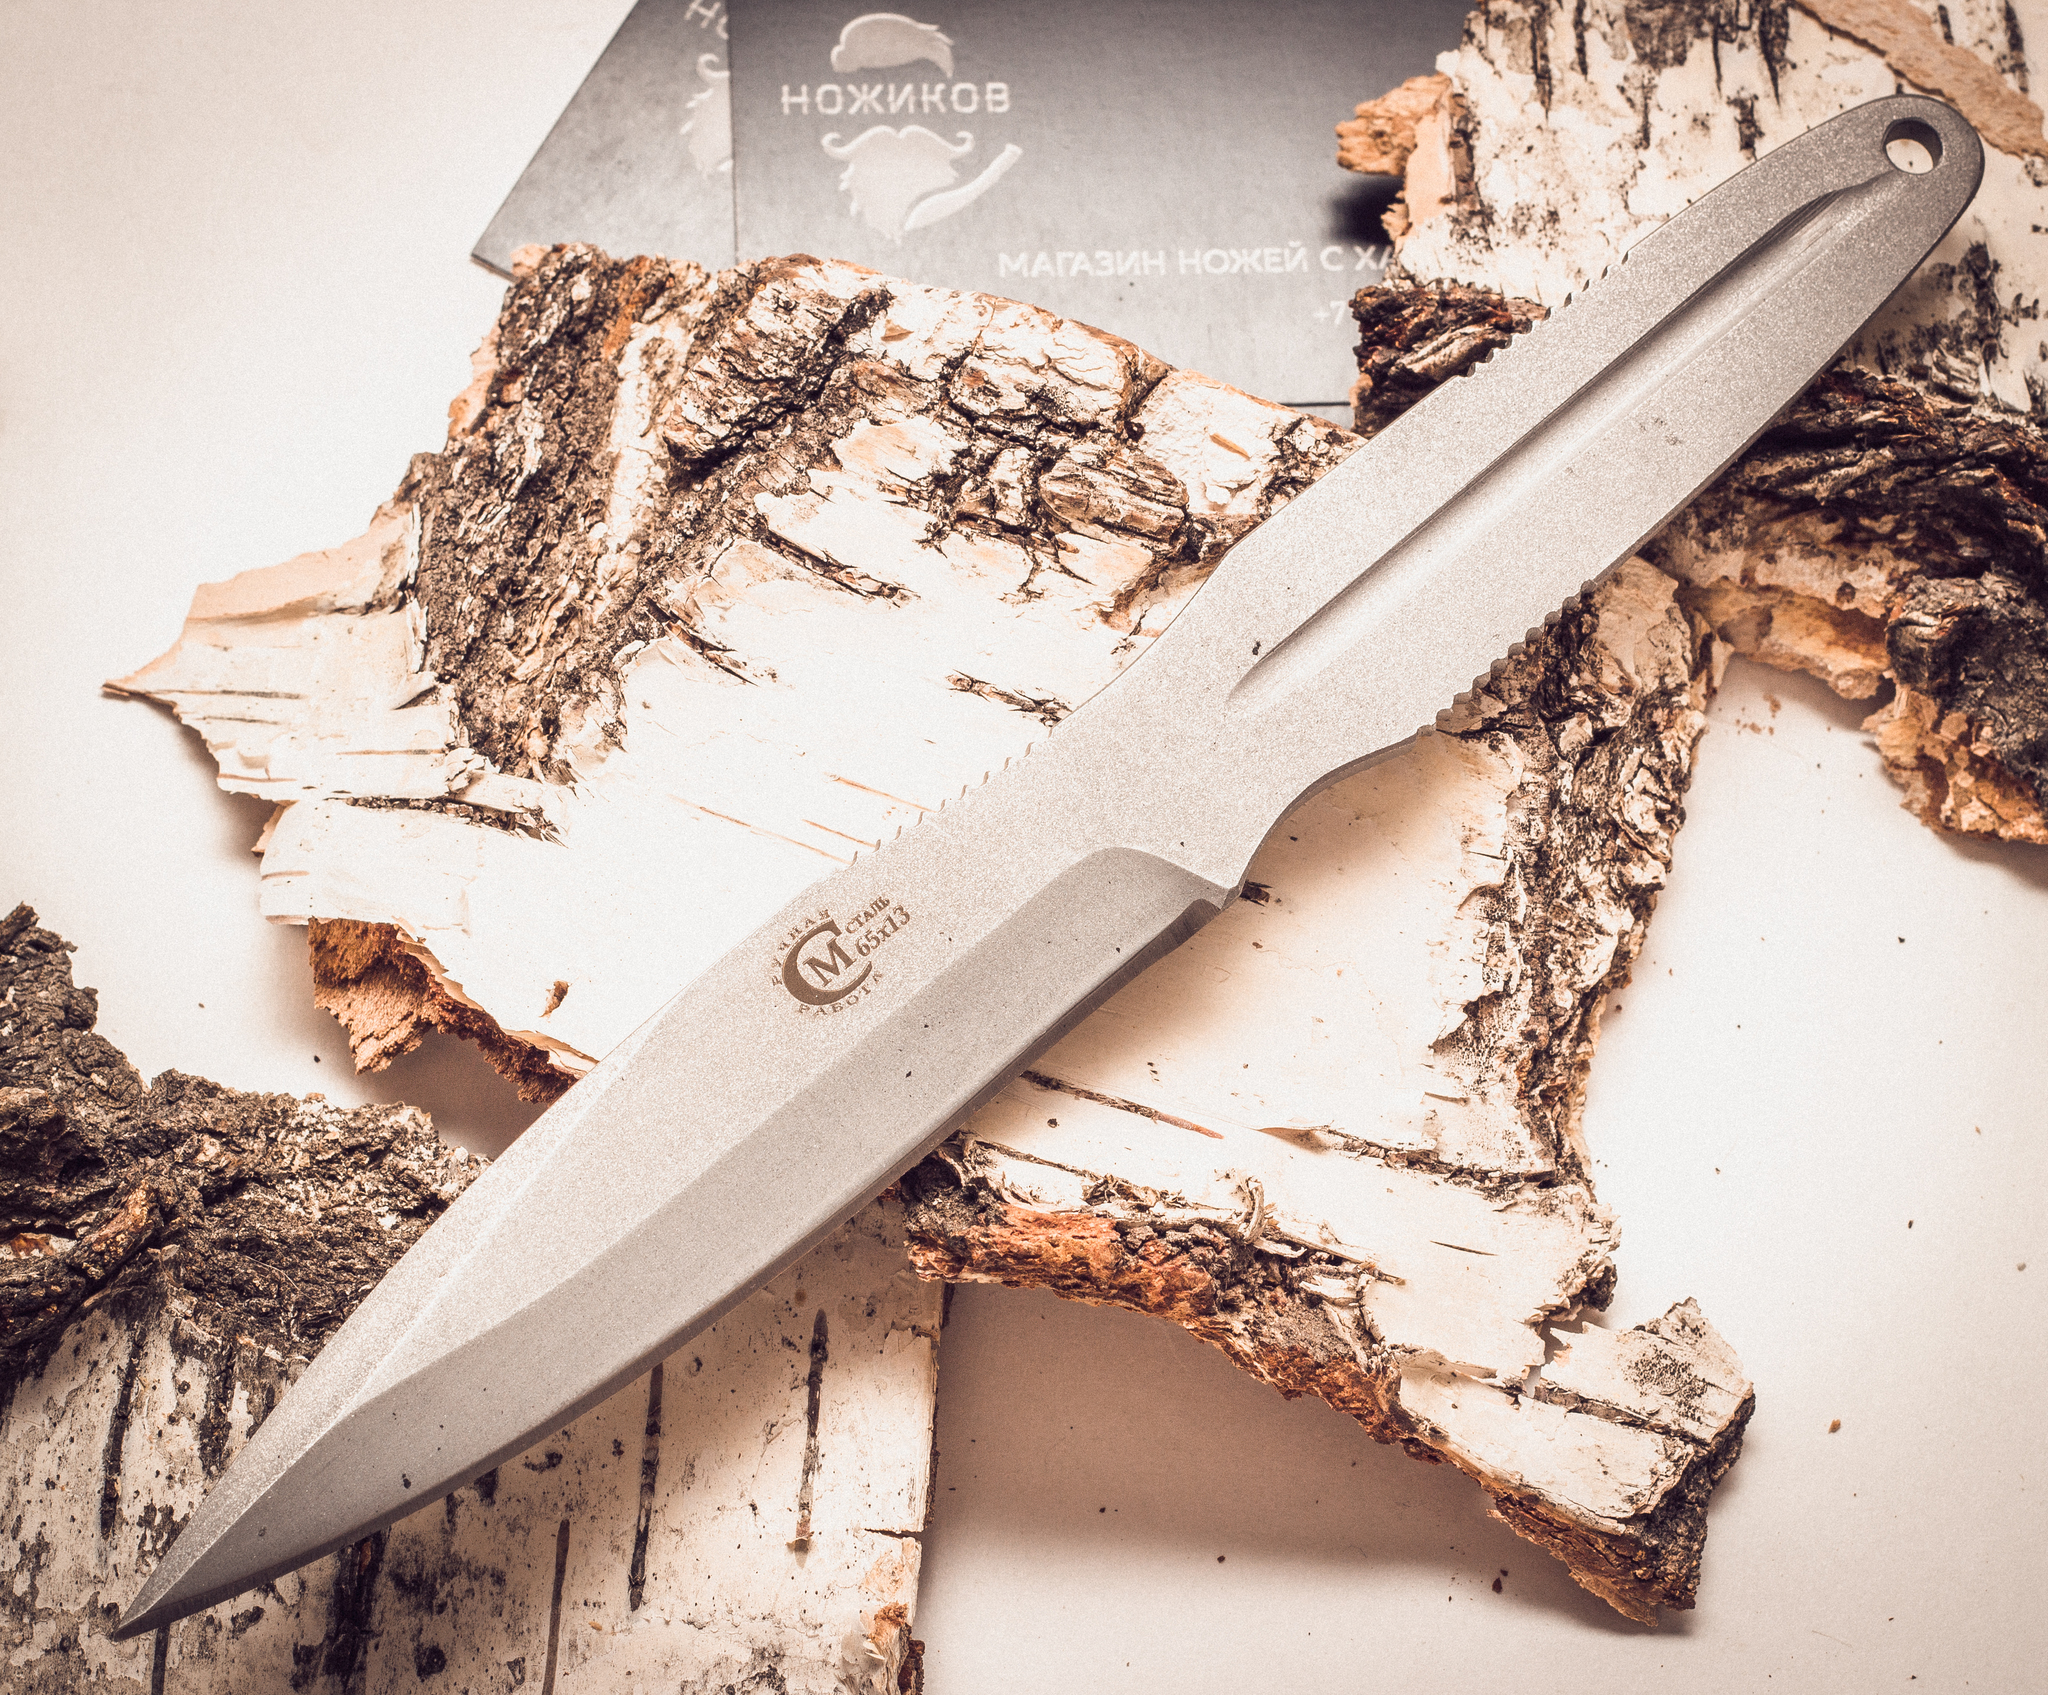 Нож «Удар», из нержавеющей стали 65х13Ножи Ворсма<br>Сталь 65Х13, нержавеющаяОбщая длина, мм 228Длина клинка, мм 118Ширина клинка, мм 25,1Толщина клинка, мм 4,9Длина рукояти, мм 110Толщина рукояти, мм 4,9Твёрдость клинка, HRC<br>